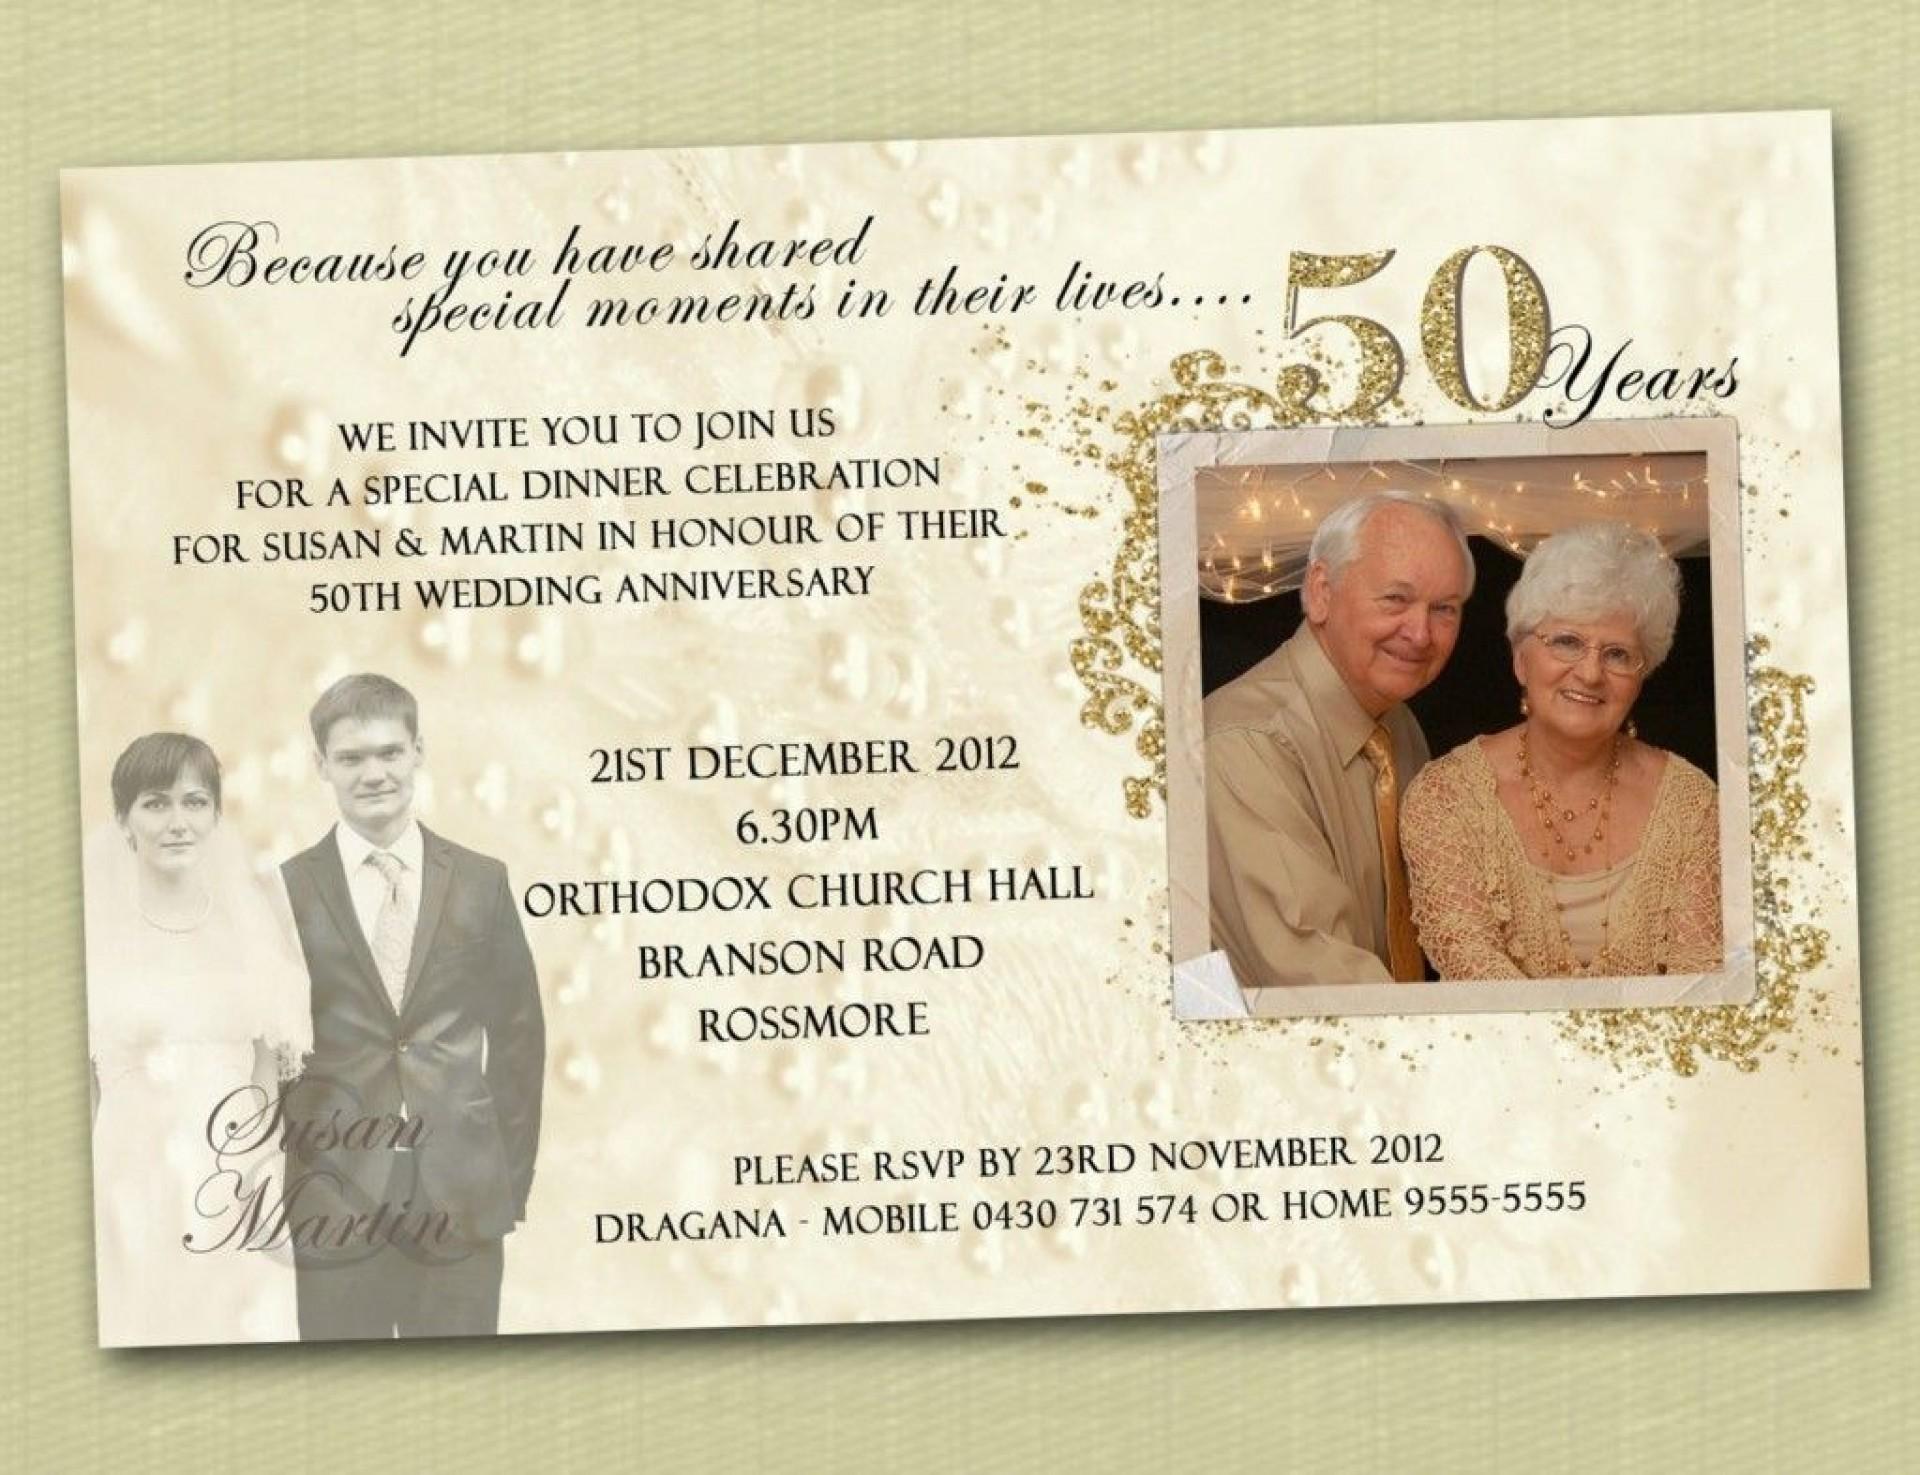 004 Rare 50th Wedding Anniversary Invitation Sample Example  Samples Free Party Template Card Idea1920